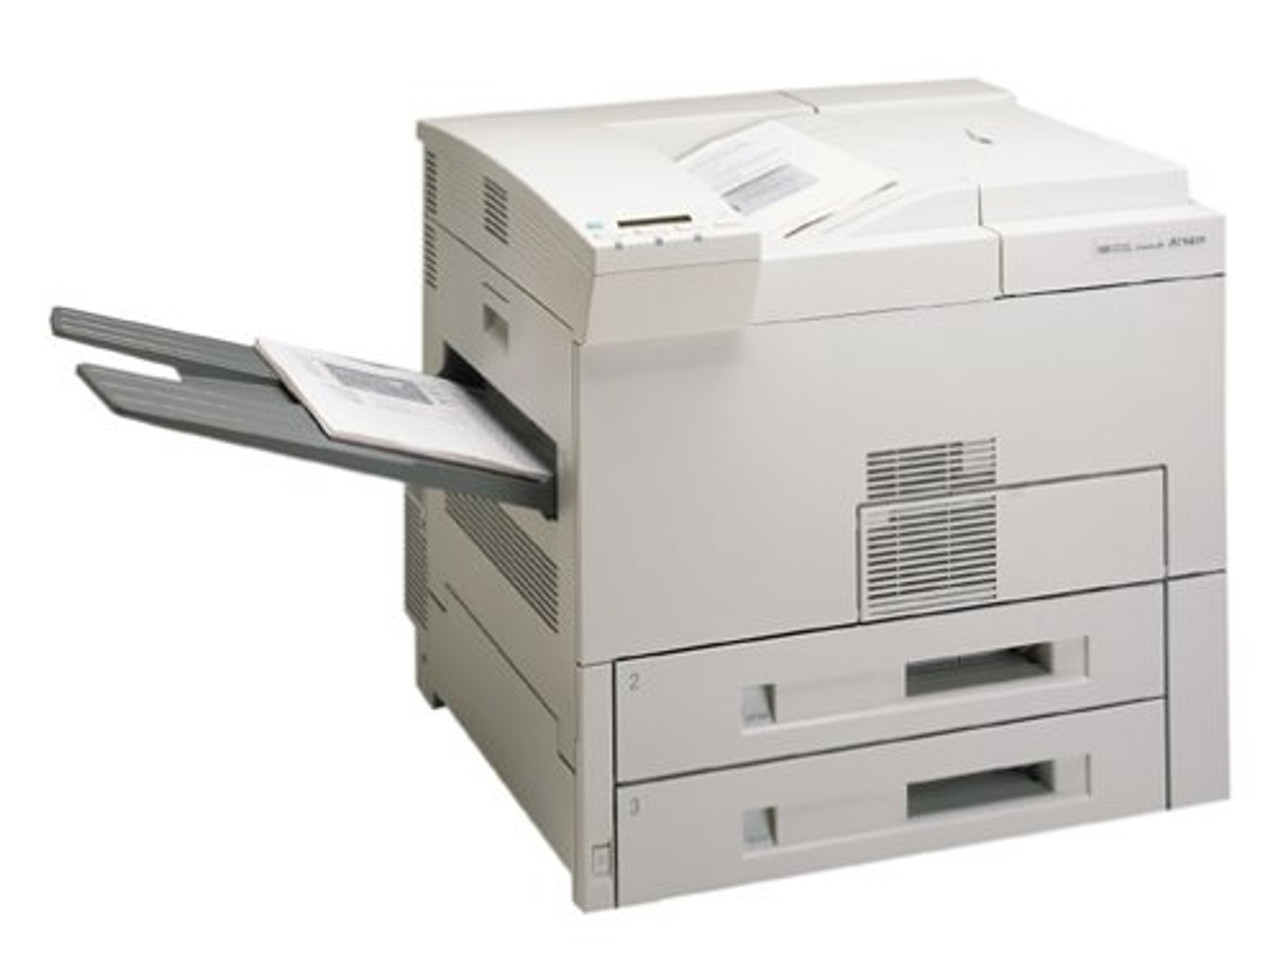 HP LaserJet 8000n - C4086A#ABA - HP 11x17 Laser Printer for sale